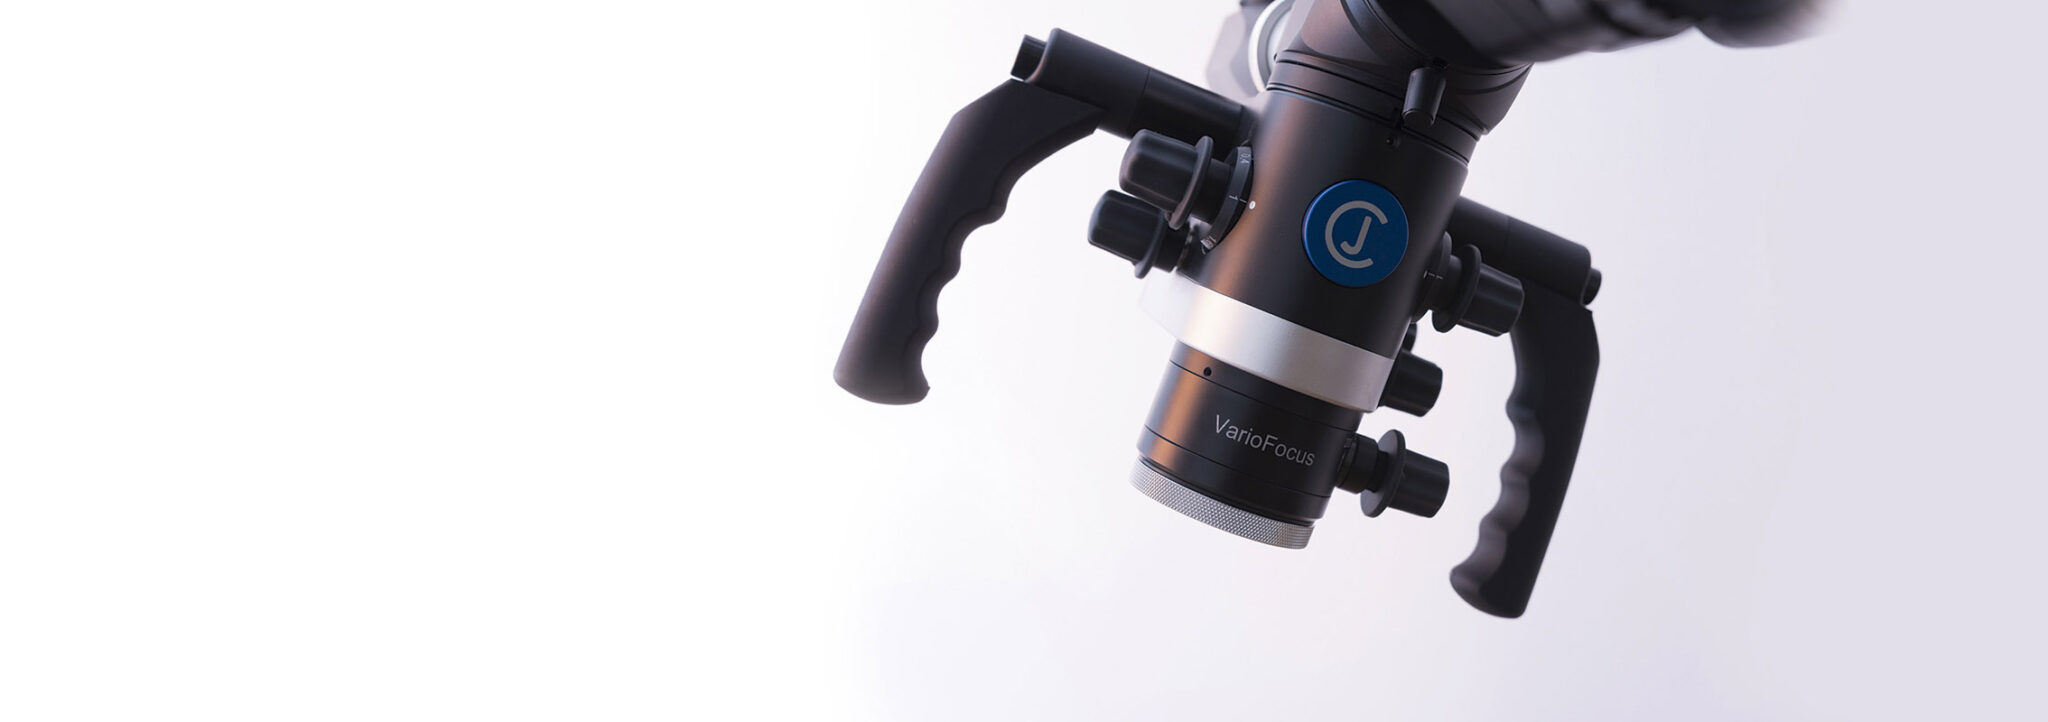 Banner microscopio CJ-Optik